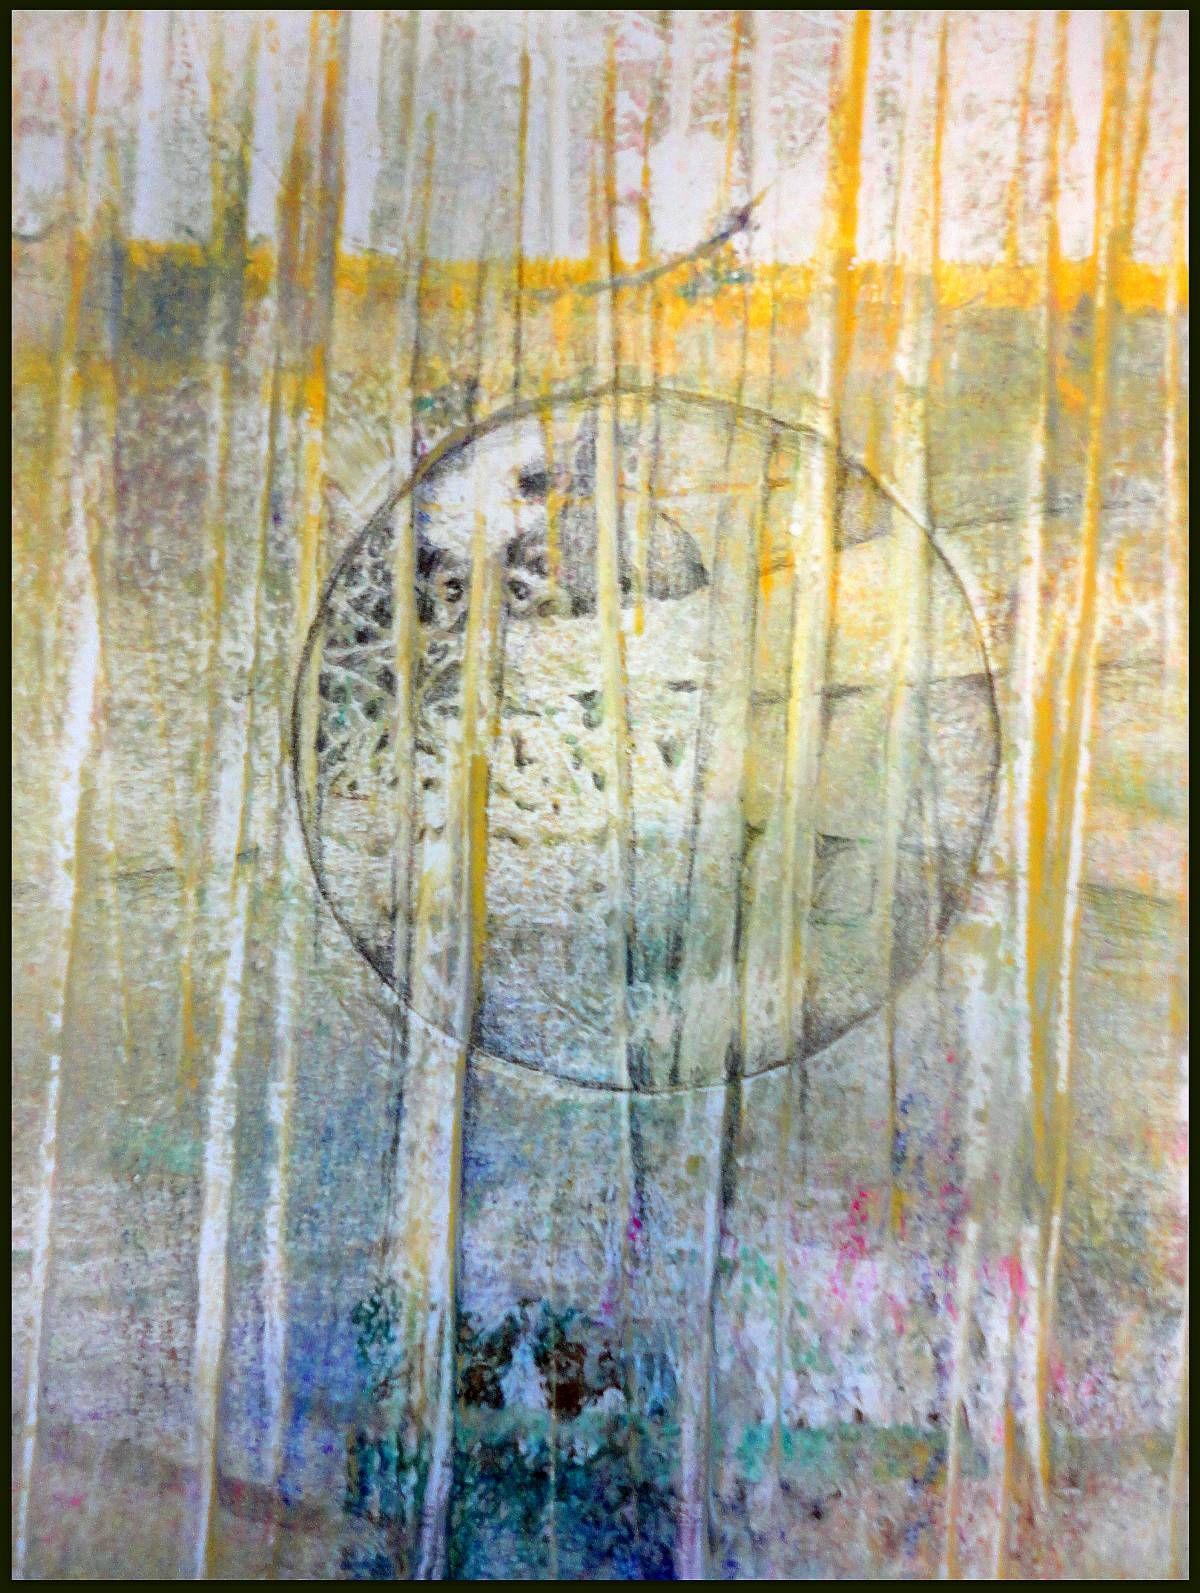 Gerda Lipski Atelier 21 Bildergalerie Inspirierende Kunst